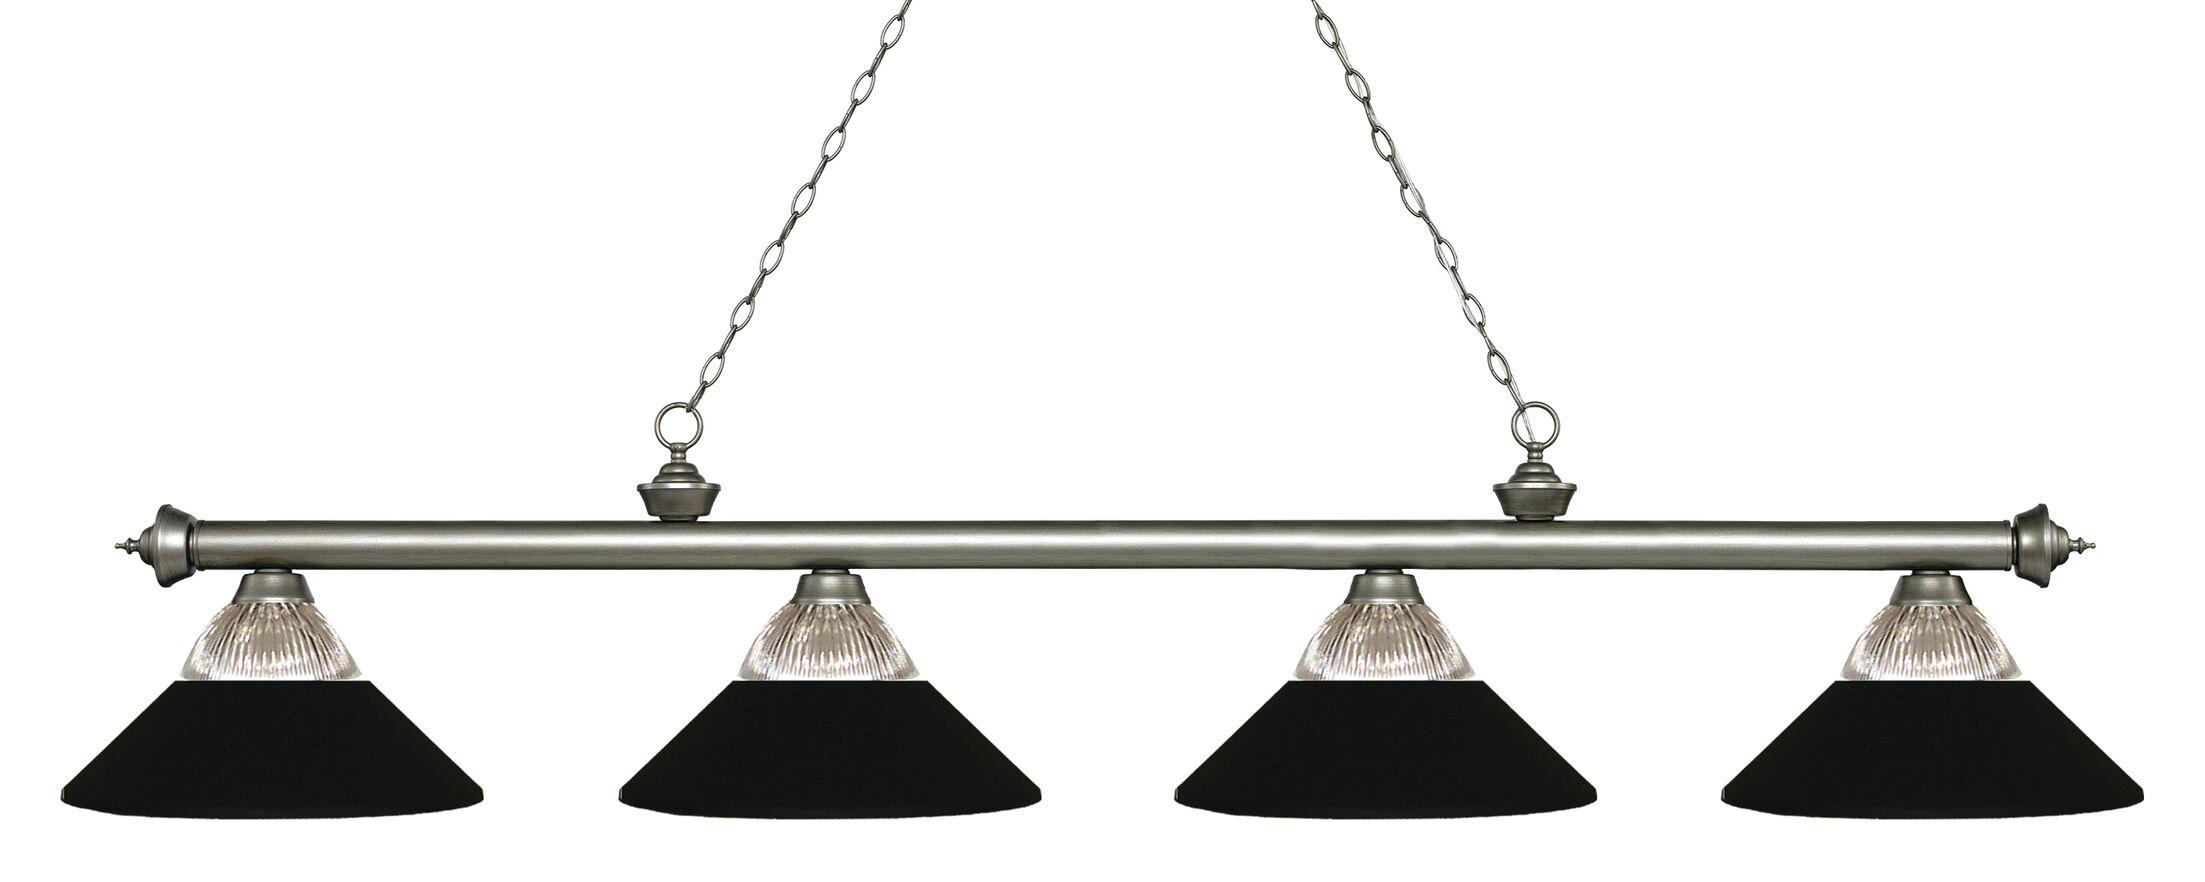 Chapple 4-Light Billiard Light Shade Color: Matte Black, Finish: Antique Silver